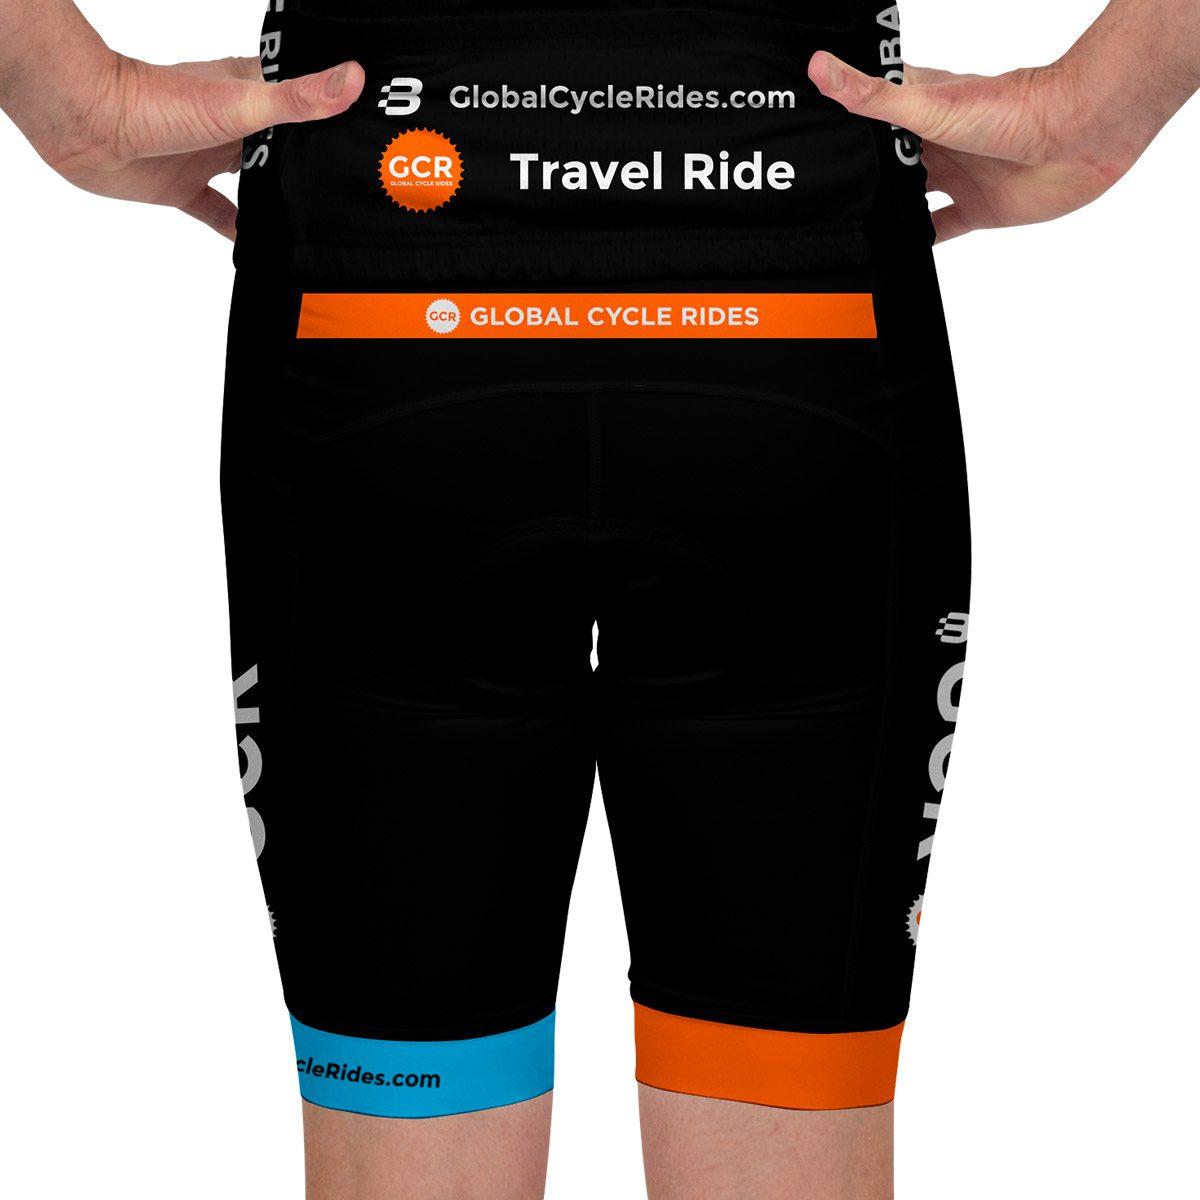 b234f4195e5 ... Global Cycle Rides - Mens Pro Kit - VL64683 - Bib Knicks - Front  Global  ...